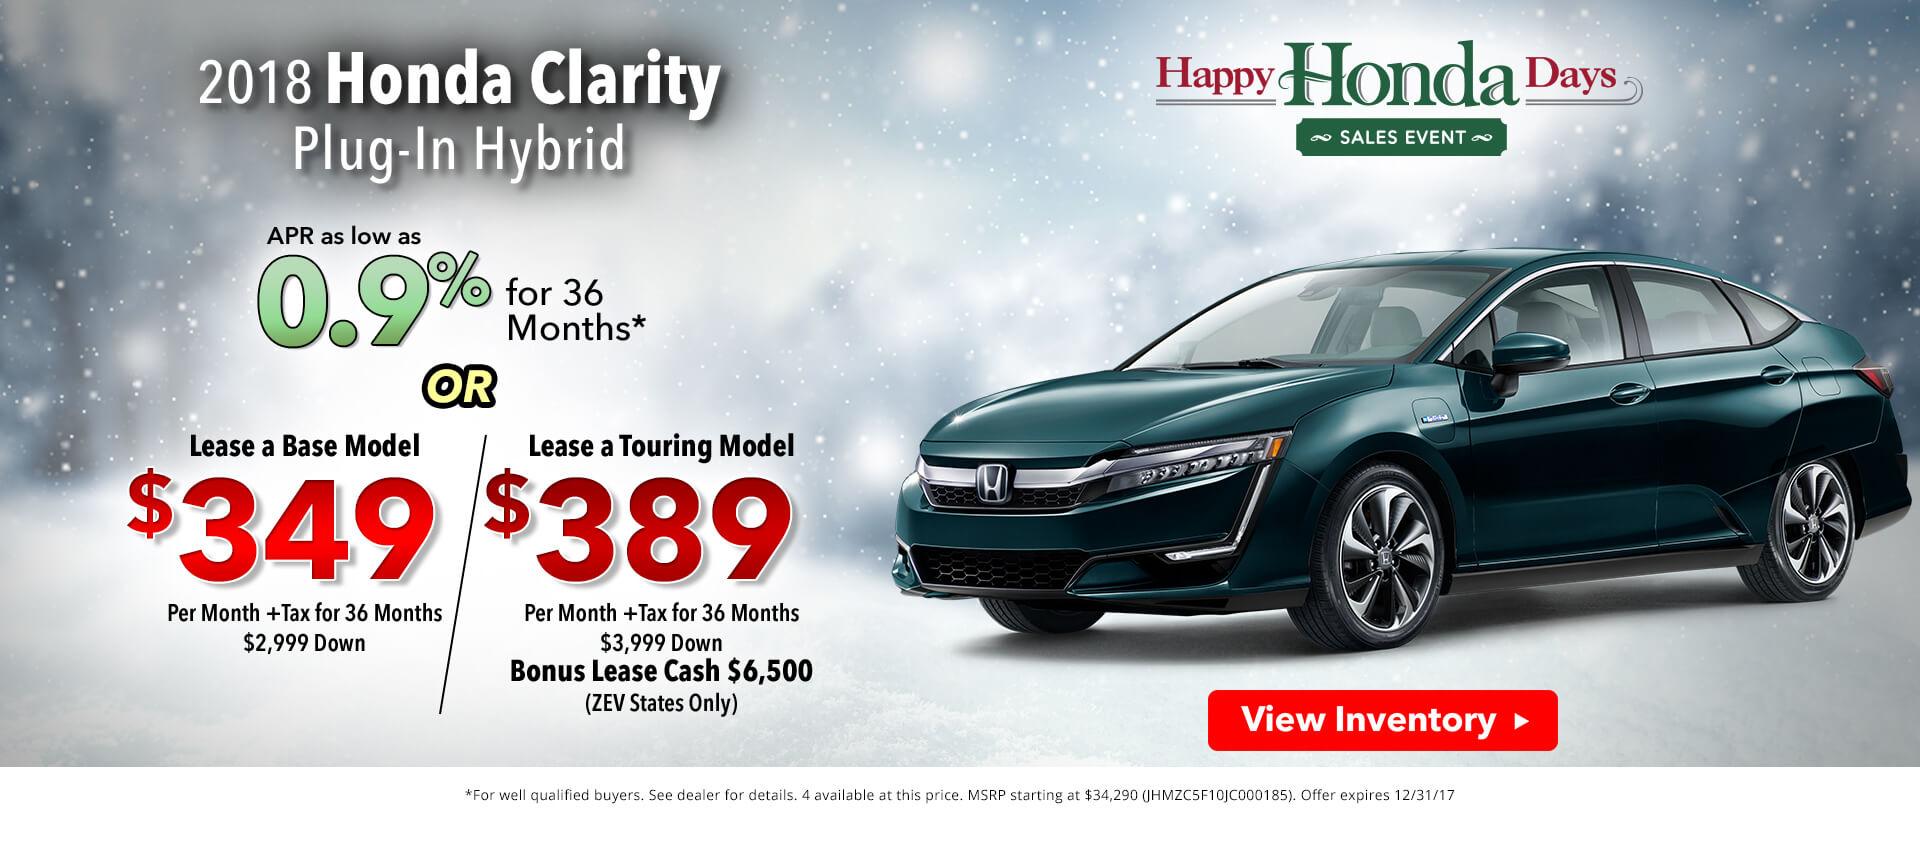 Clarity HP